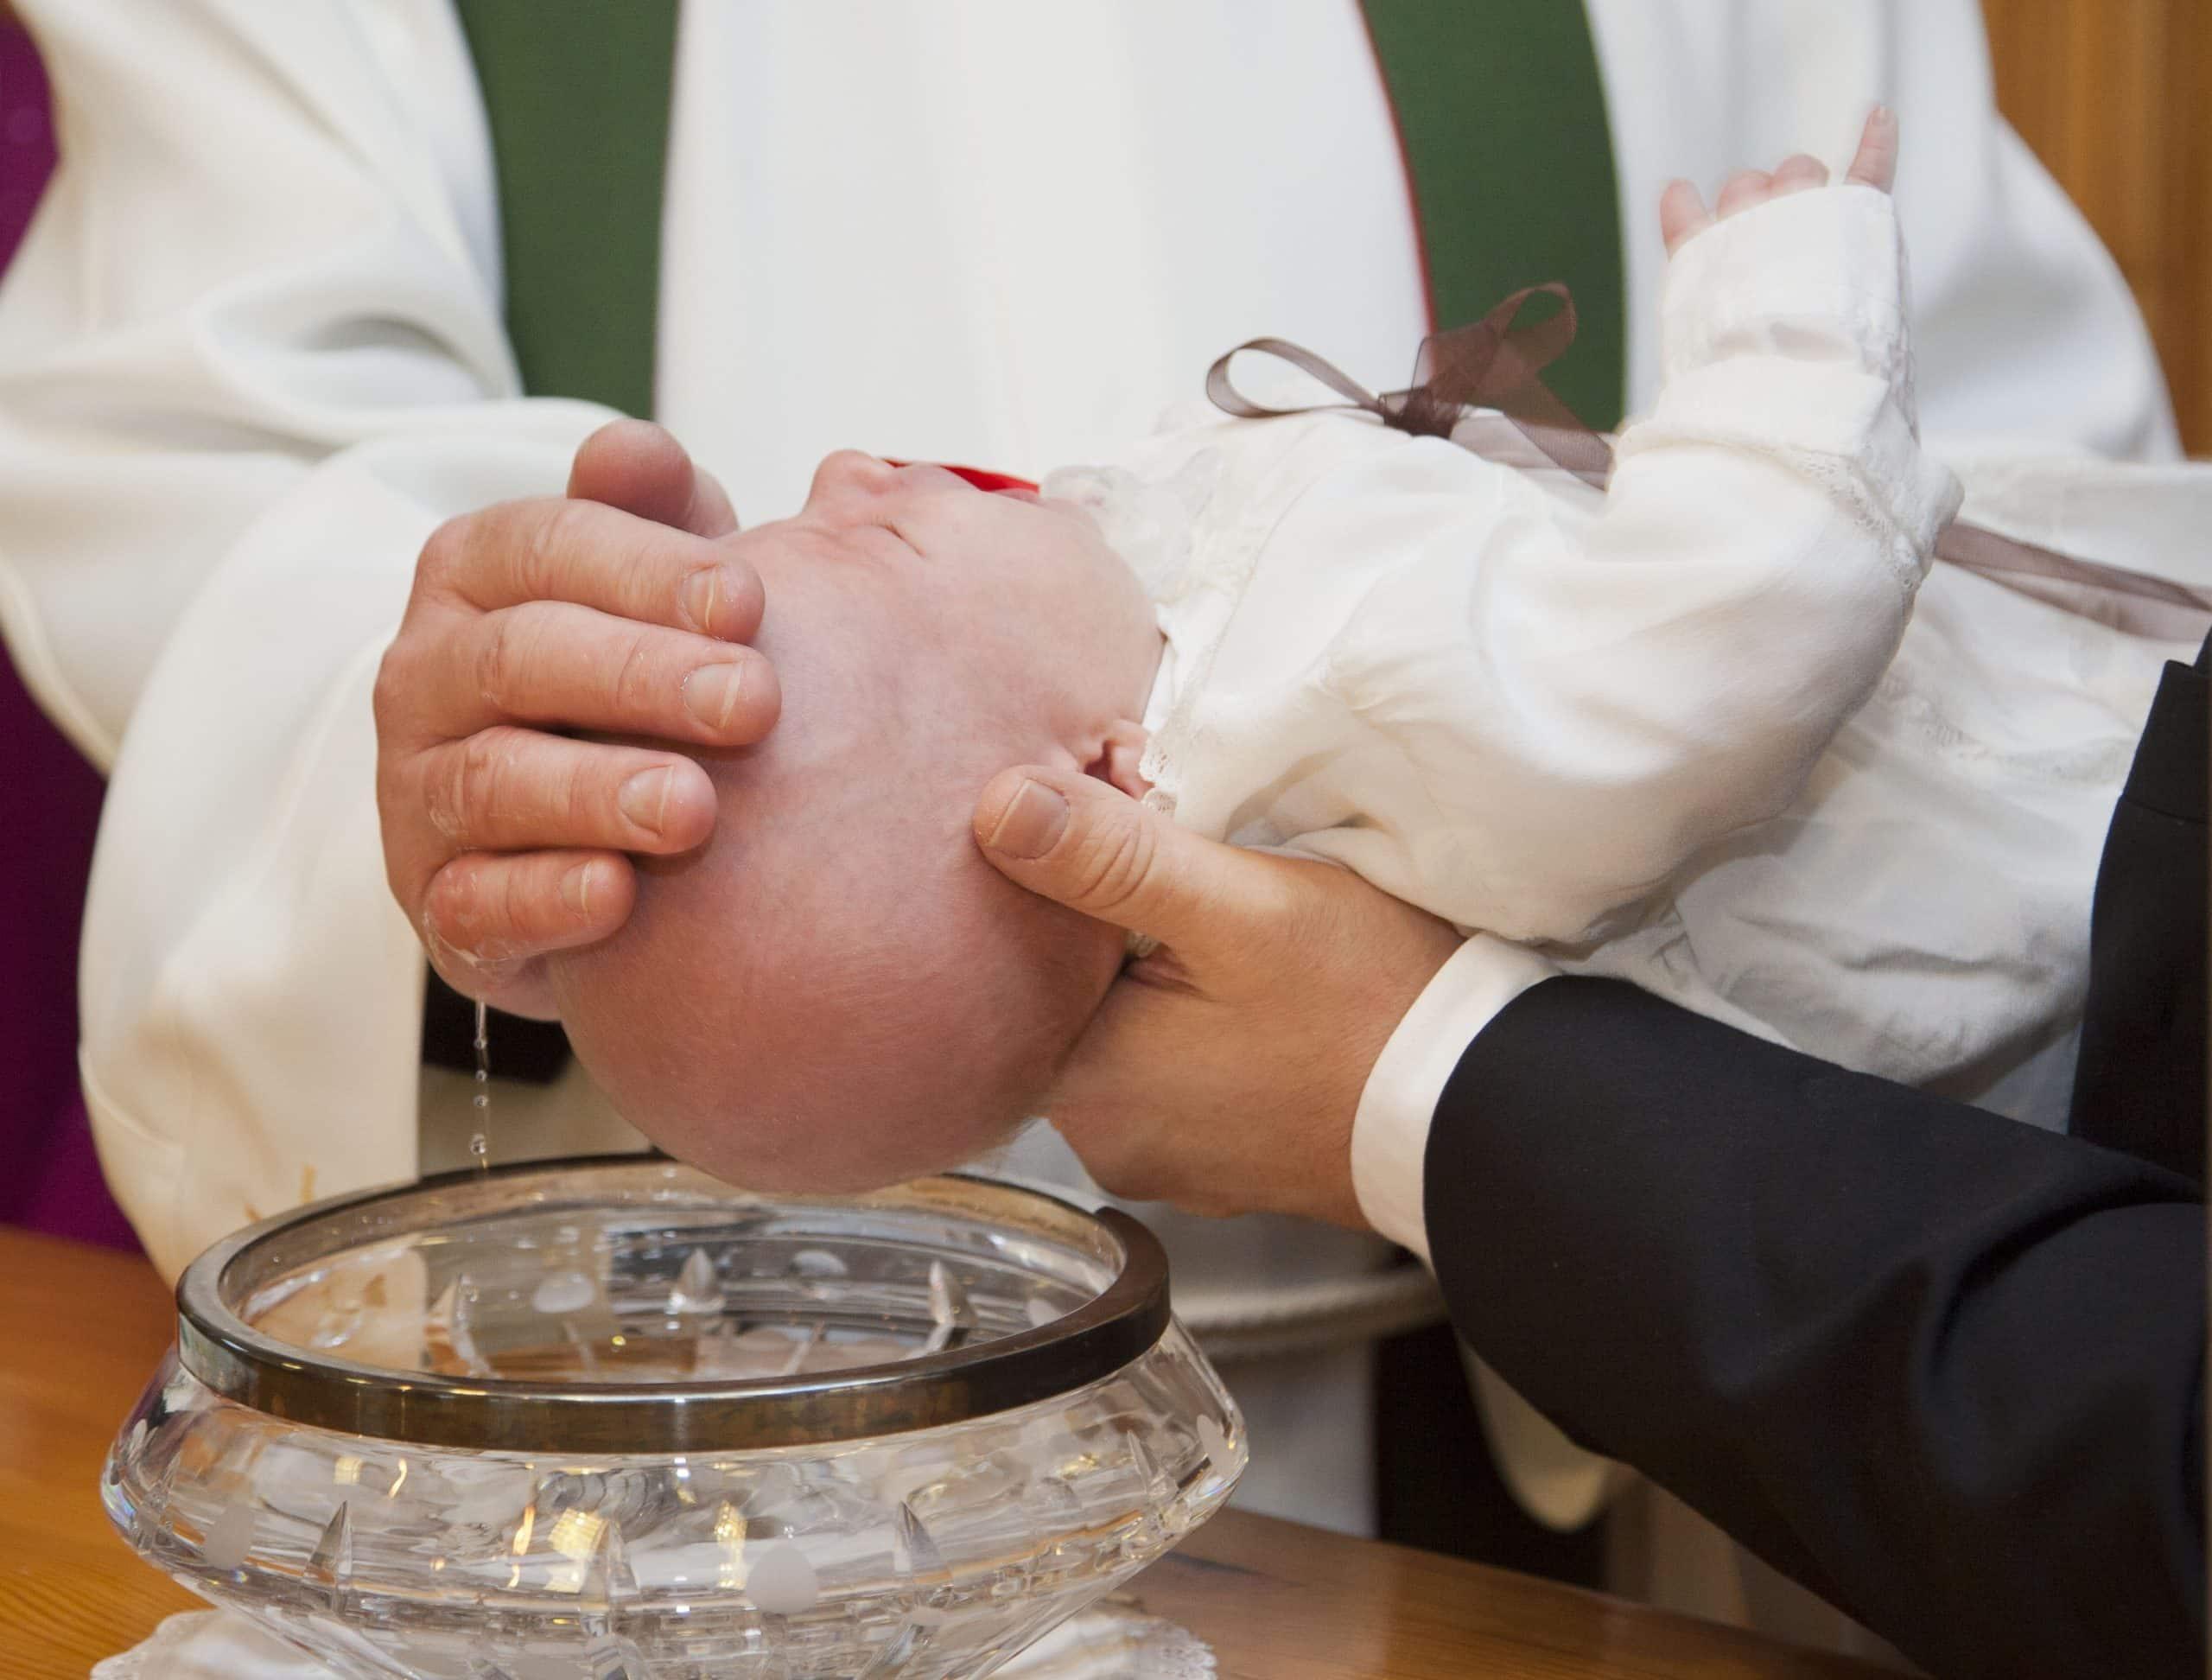 Baptism St. Mary's Church St. Mary's Parish Athlone Coosan Church